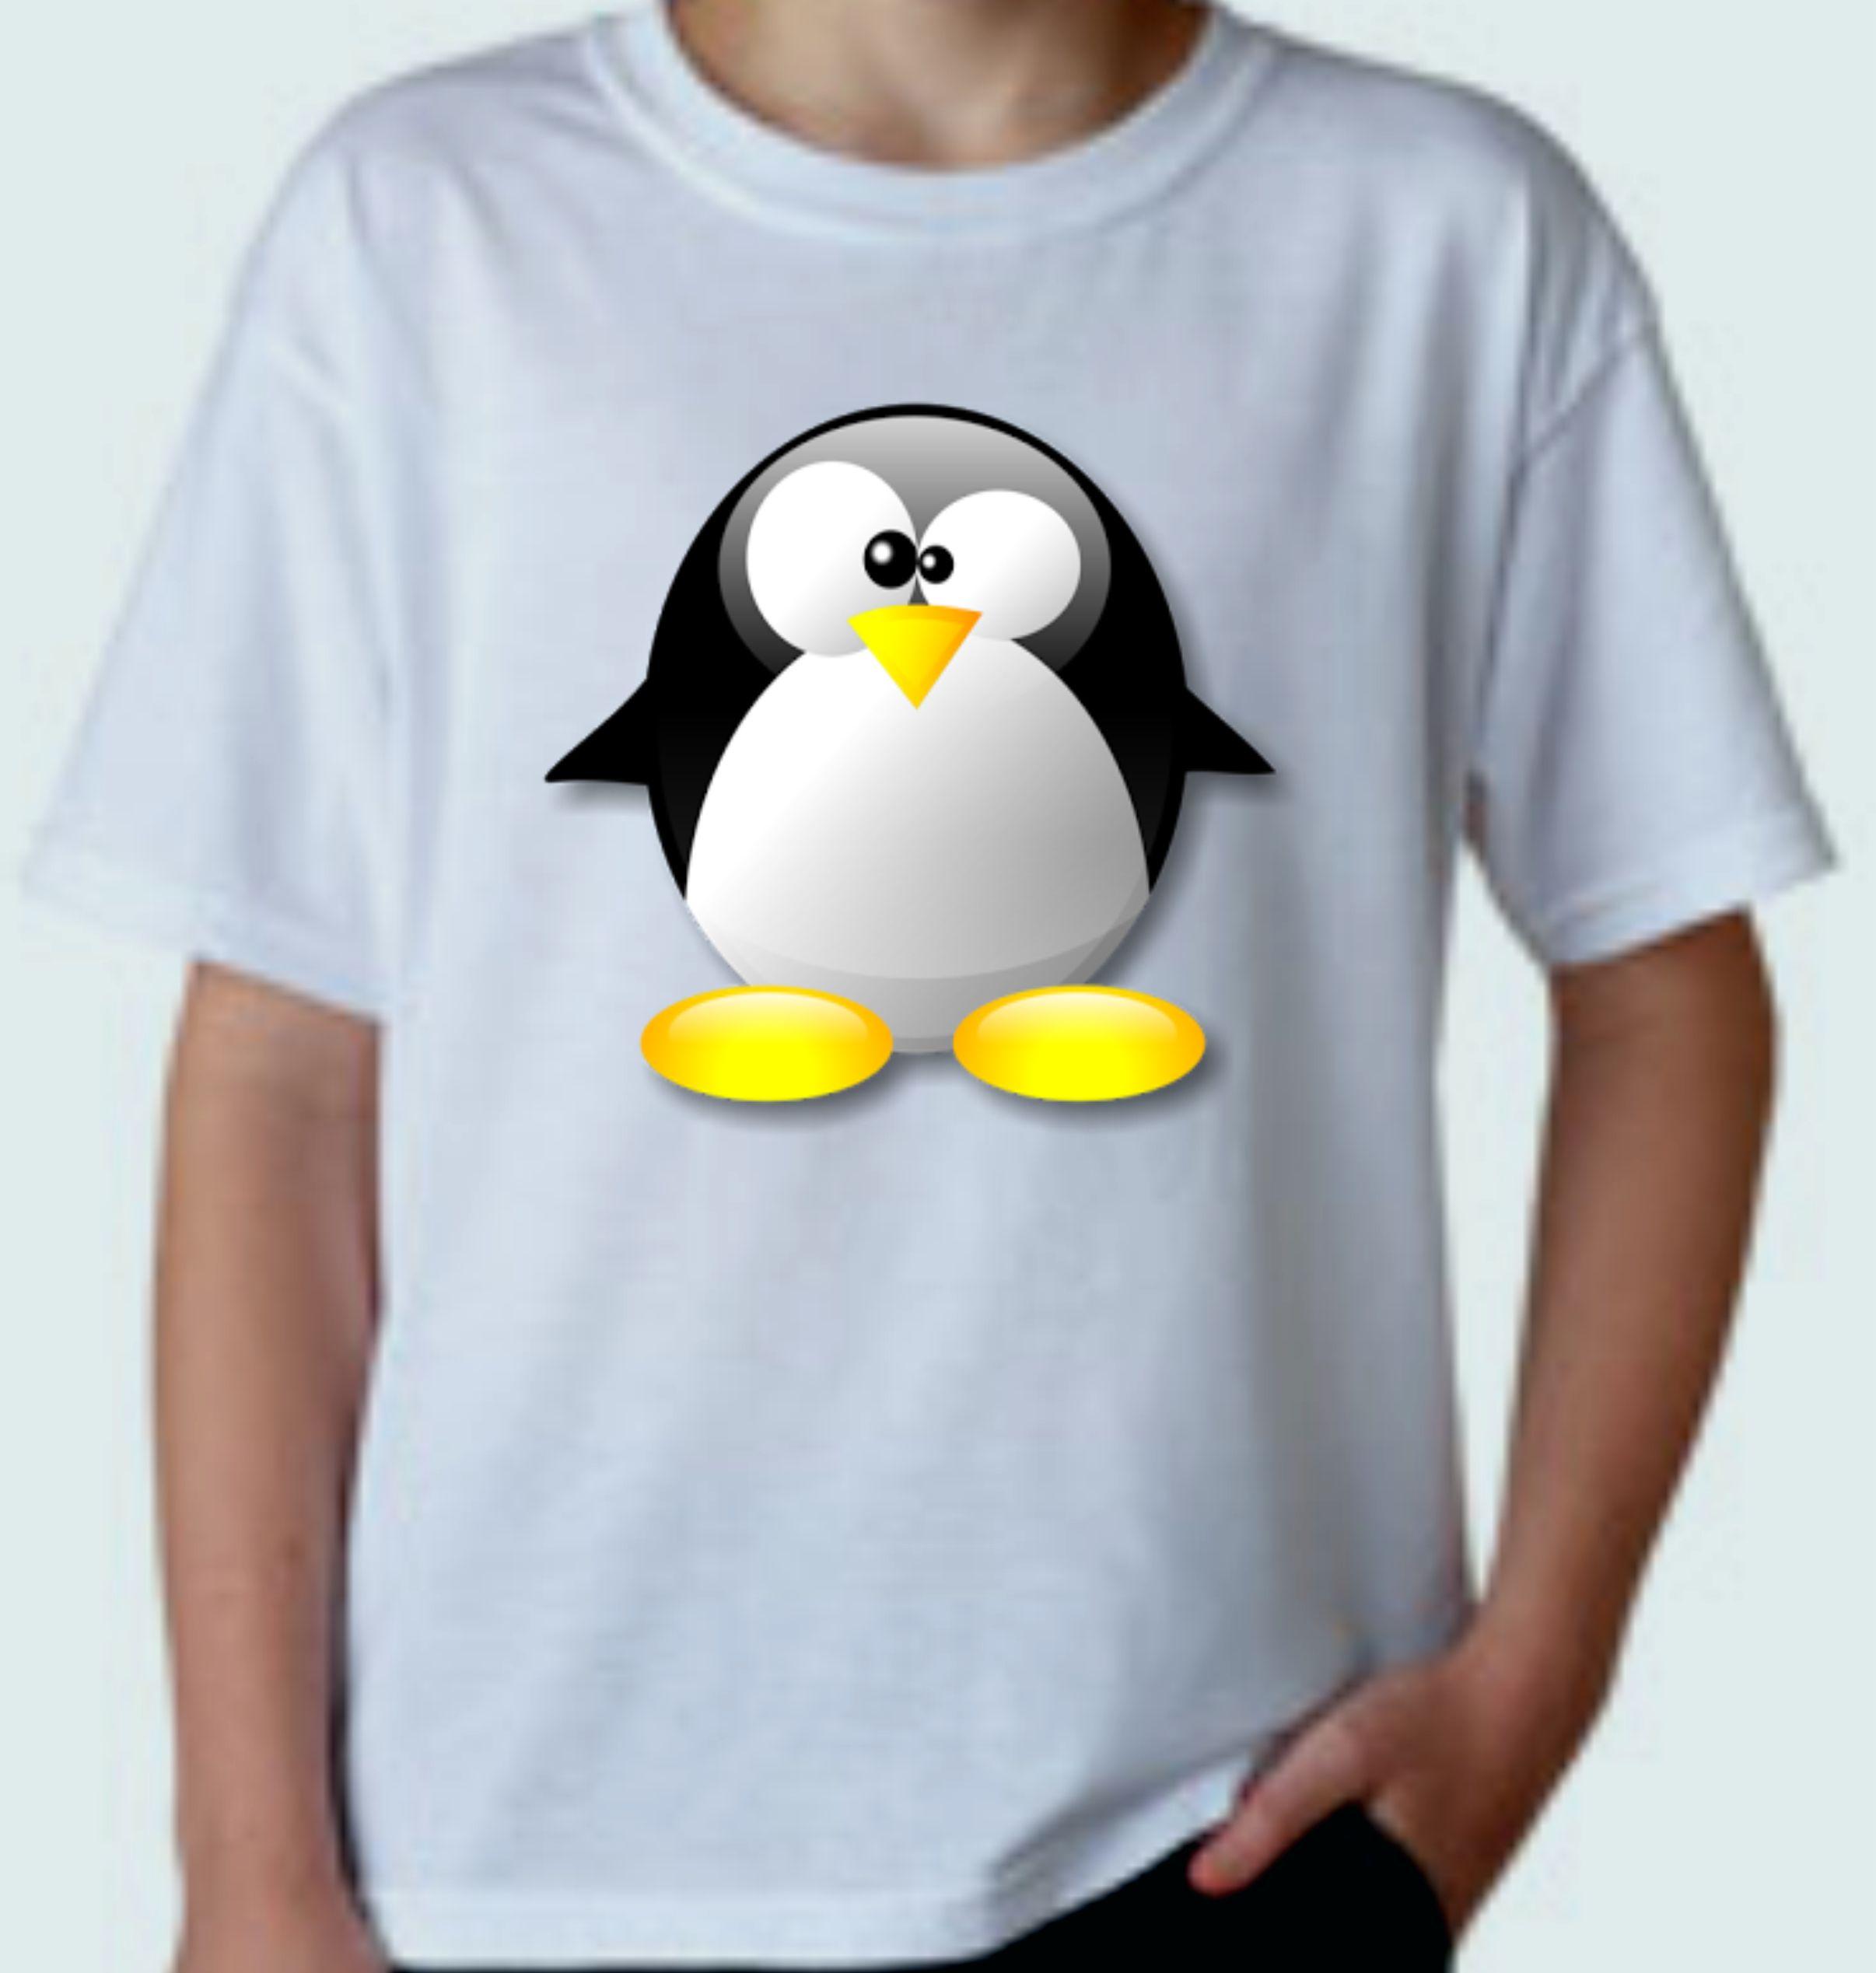 bbc6c44a6 Camiseta Personalizada Pinguim Antárctica